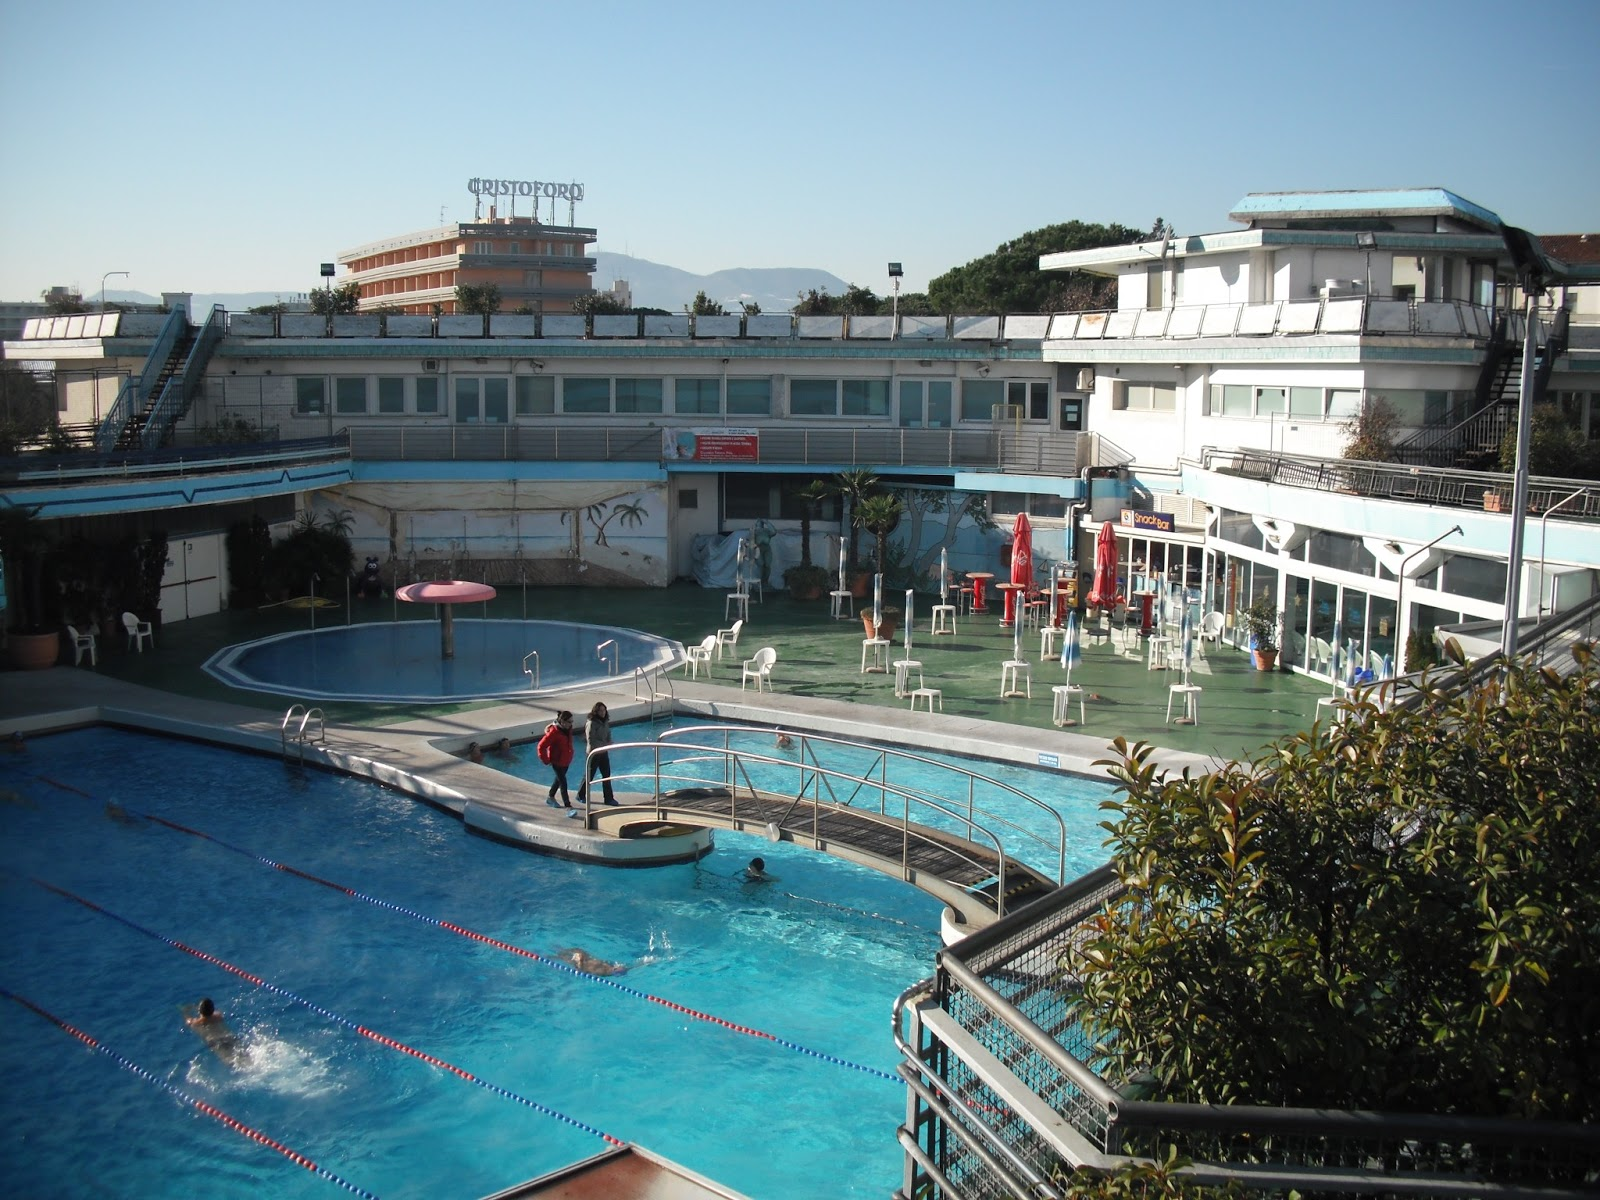 Piscina columbus abano terme dunamis urban tv rovigo for Abano terme piscine